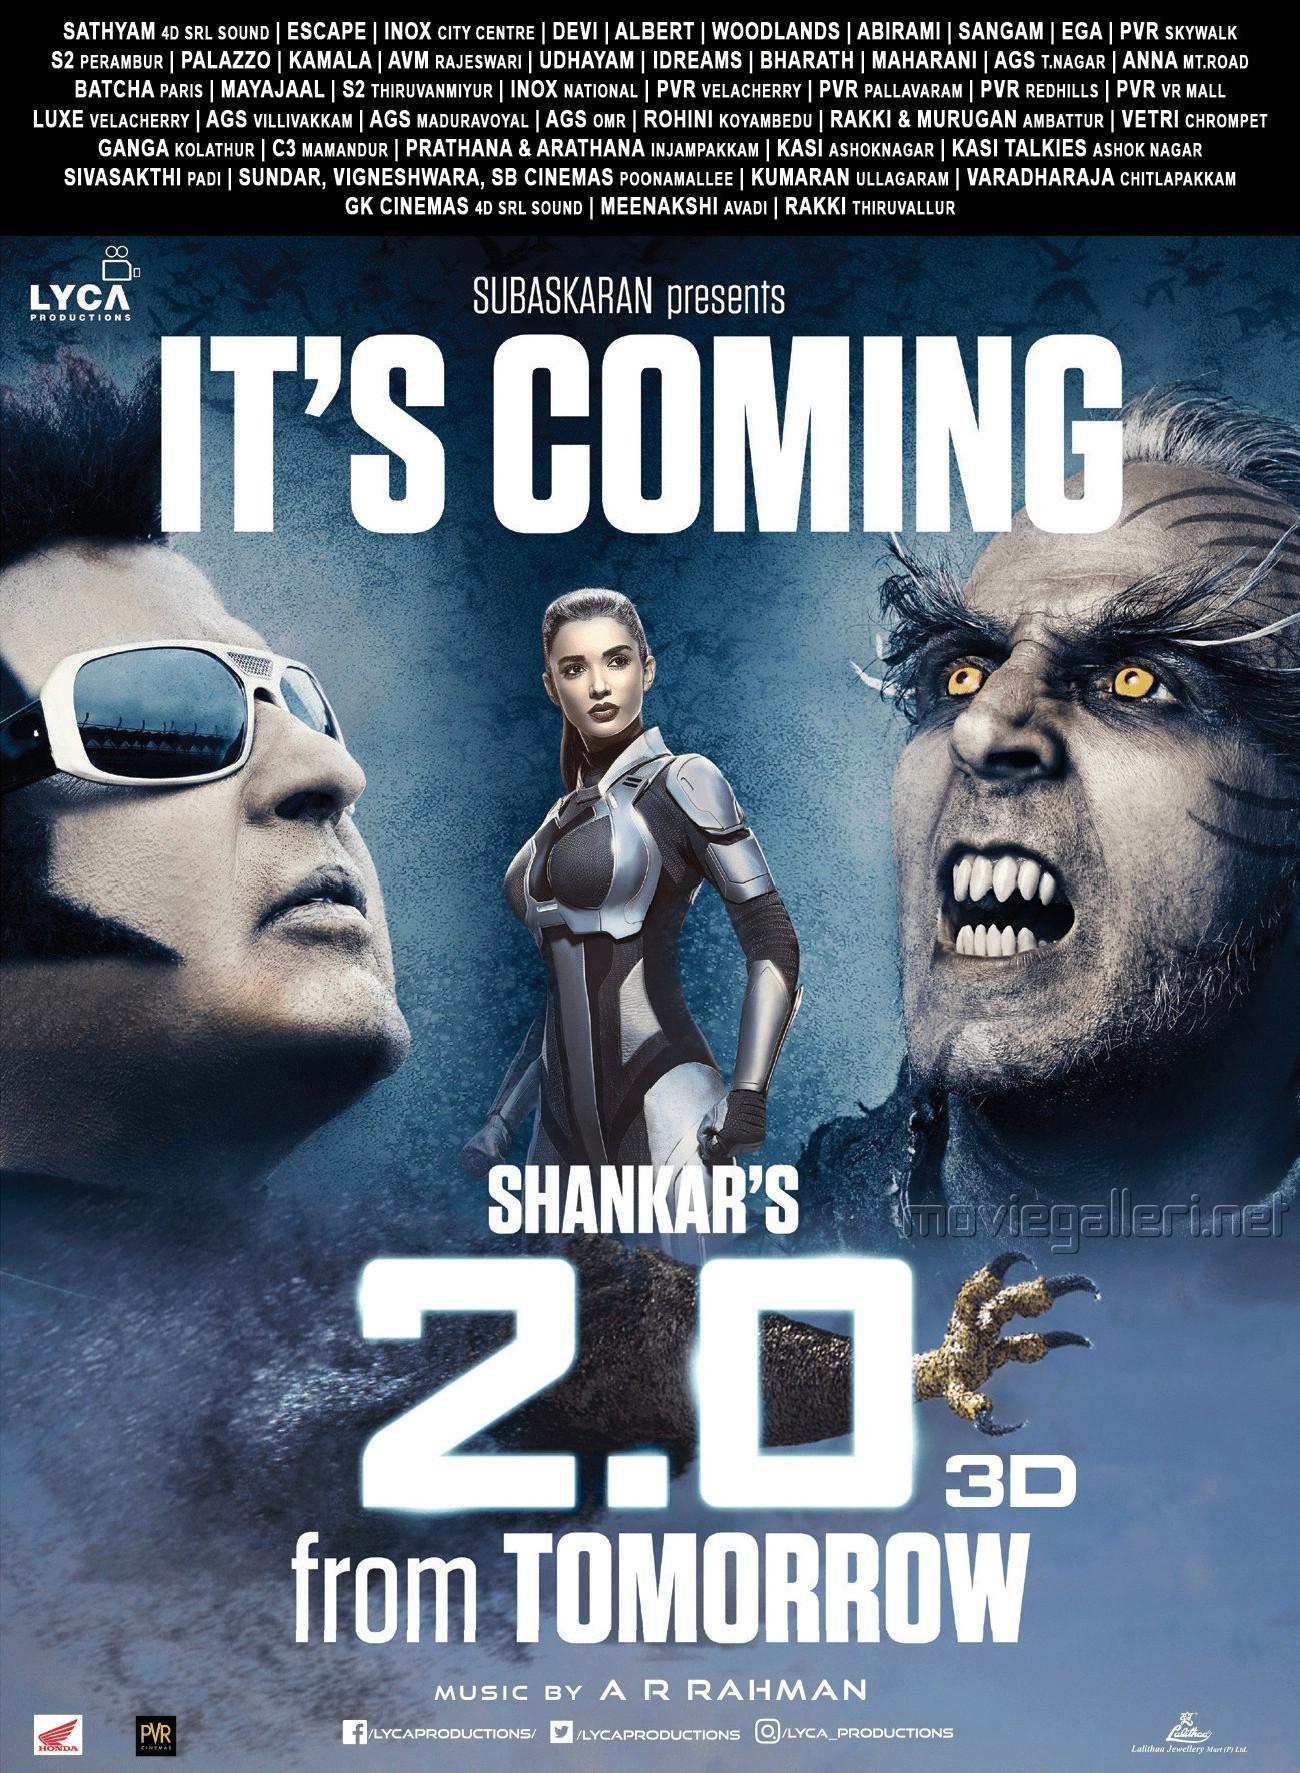 Rajinikanth, Amy Jackson, Akshay Kumar in 2.0 Movie from Tomorrow Poster HD